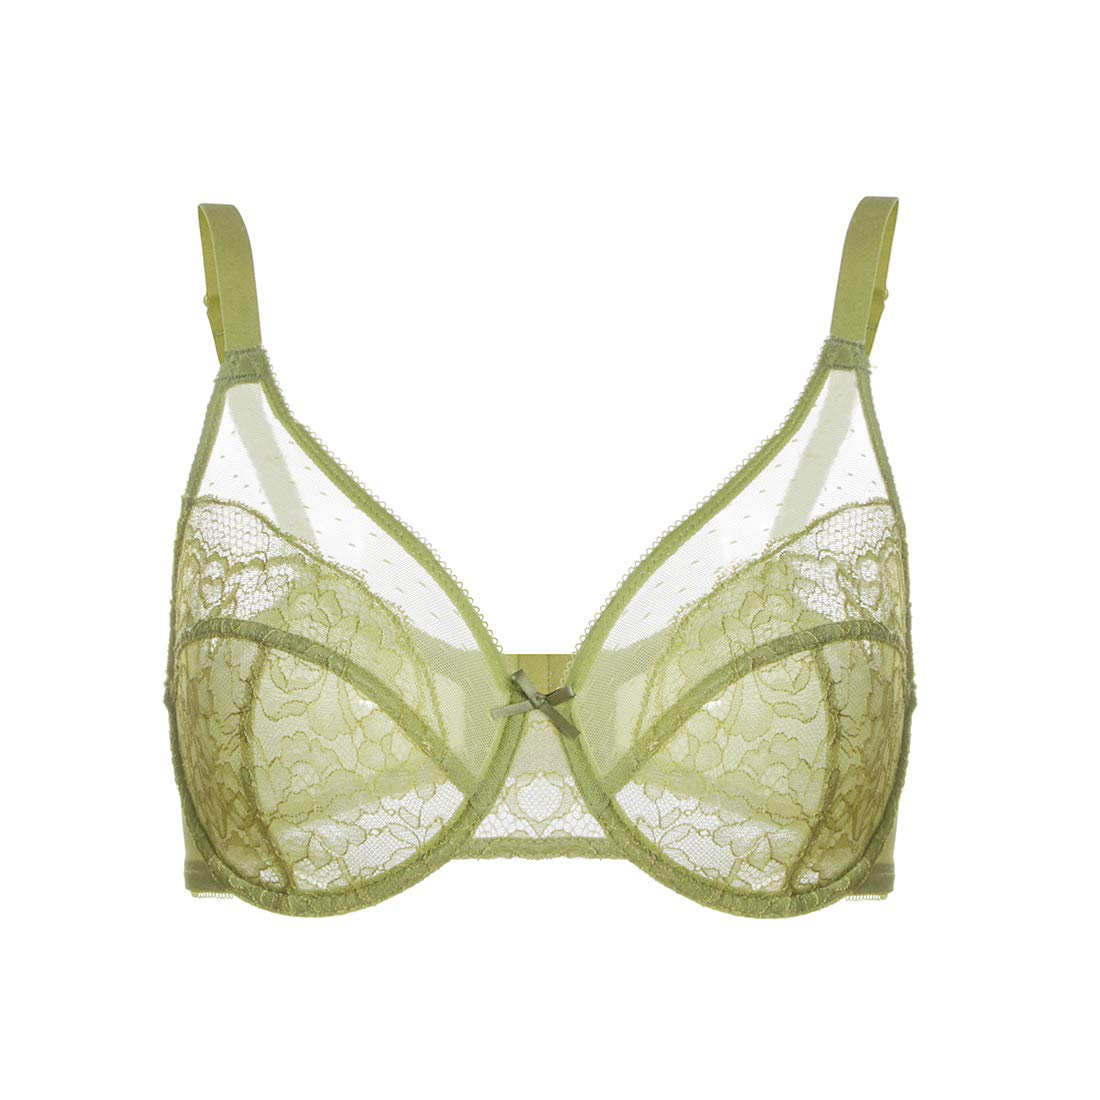 HSIA Womens Minimizer Bra Unlined Underwire Full Figure Lace Bra Plus Size Full Coverage Unpadded Bra 34C-44DDD